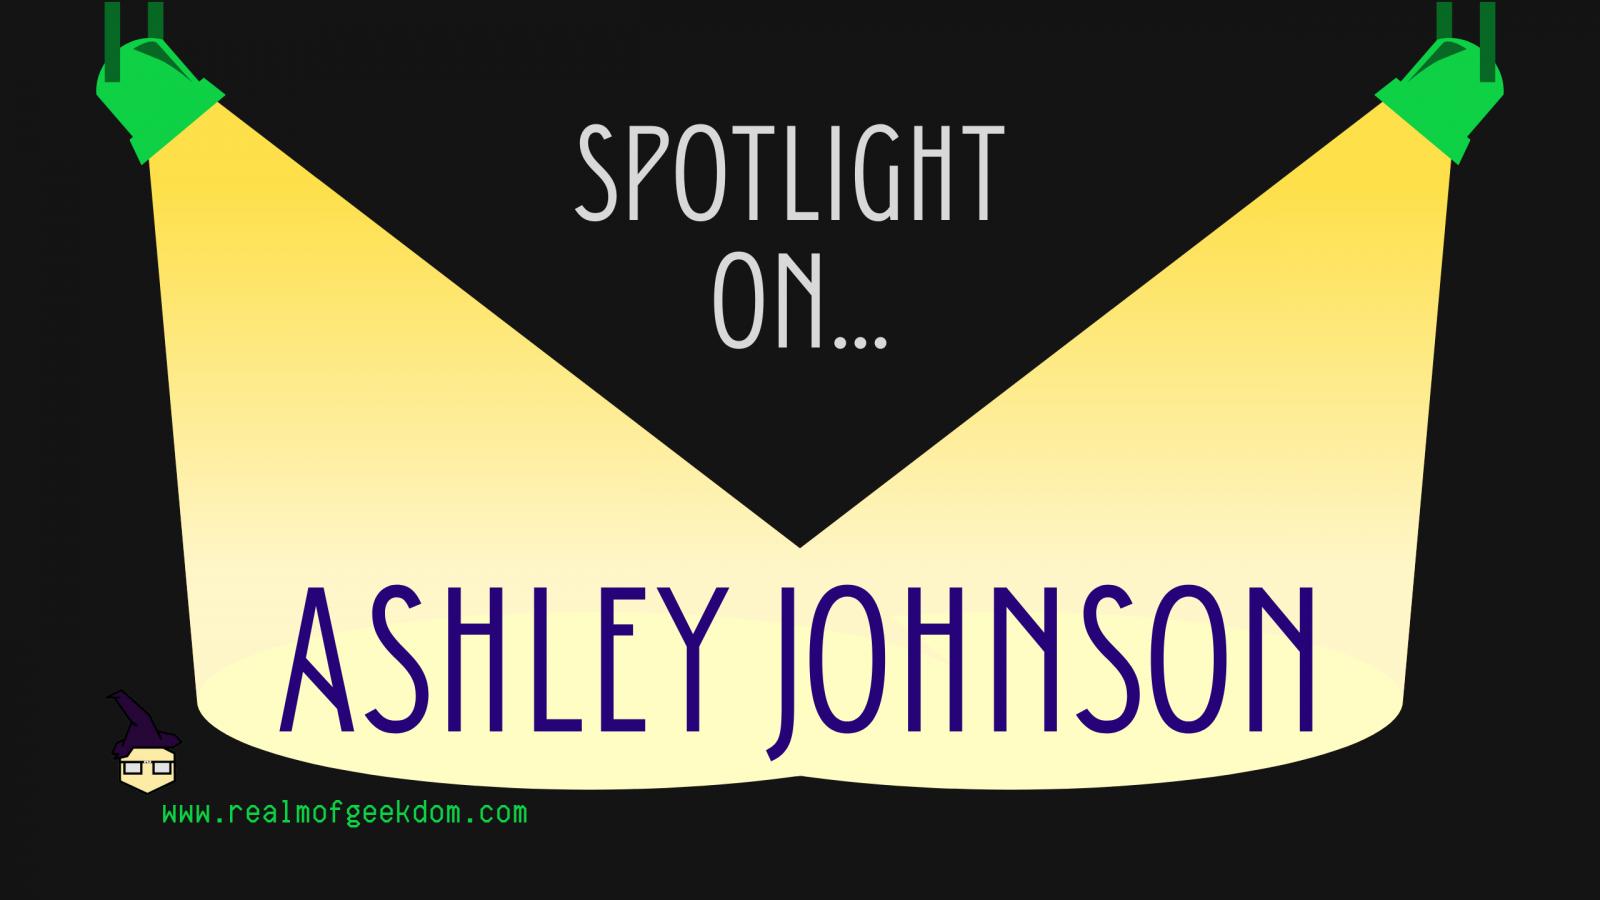 Ashley Johnson birthday spotlight title post